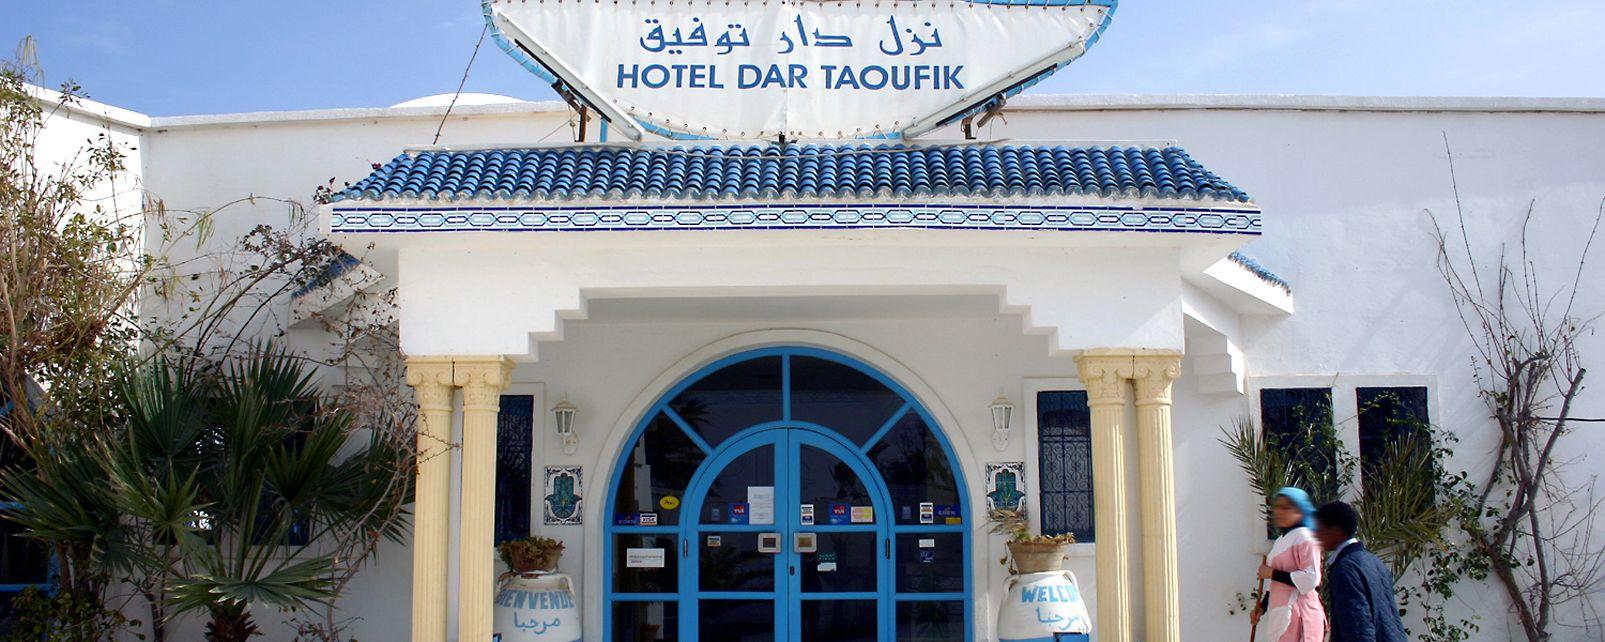 Hotel Résidence Dar Taoufik